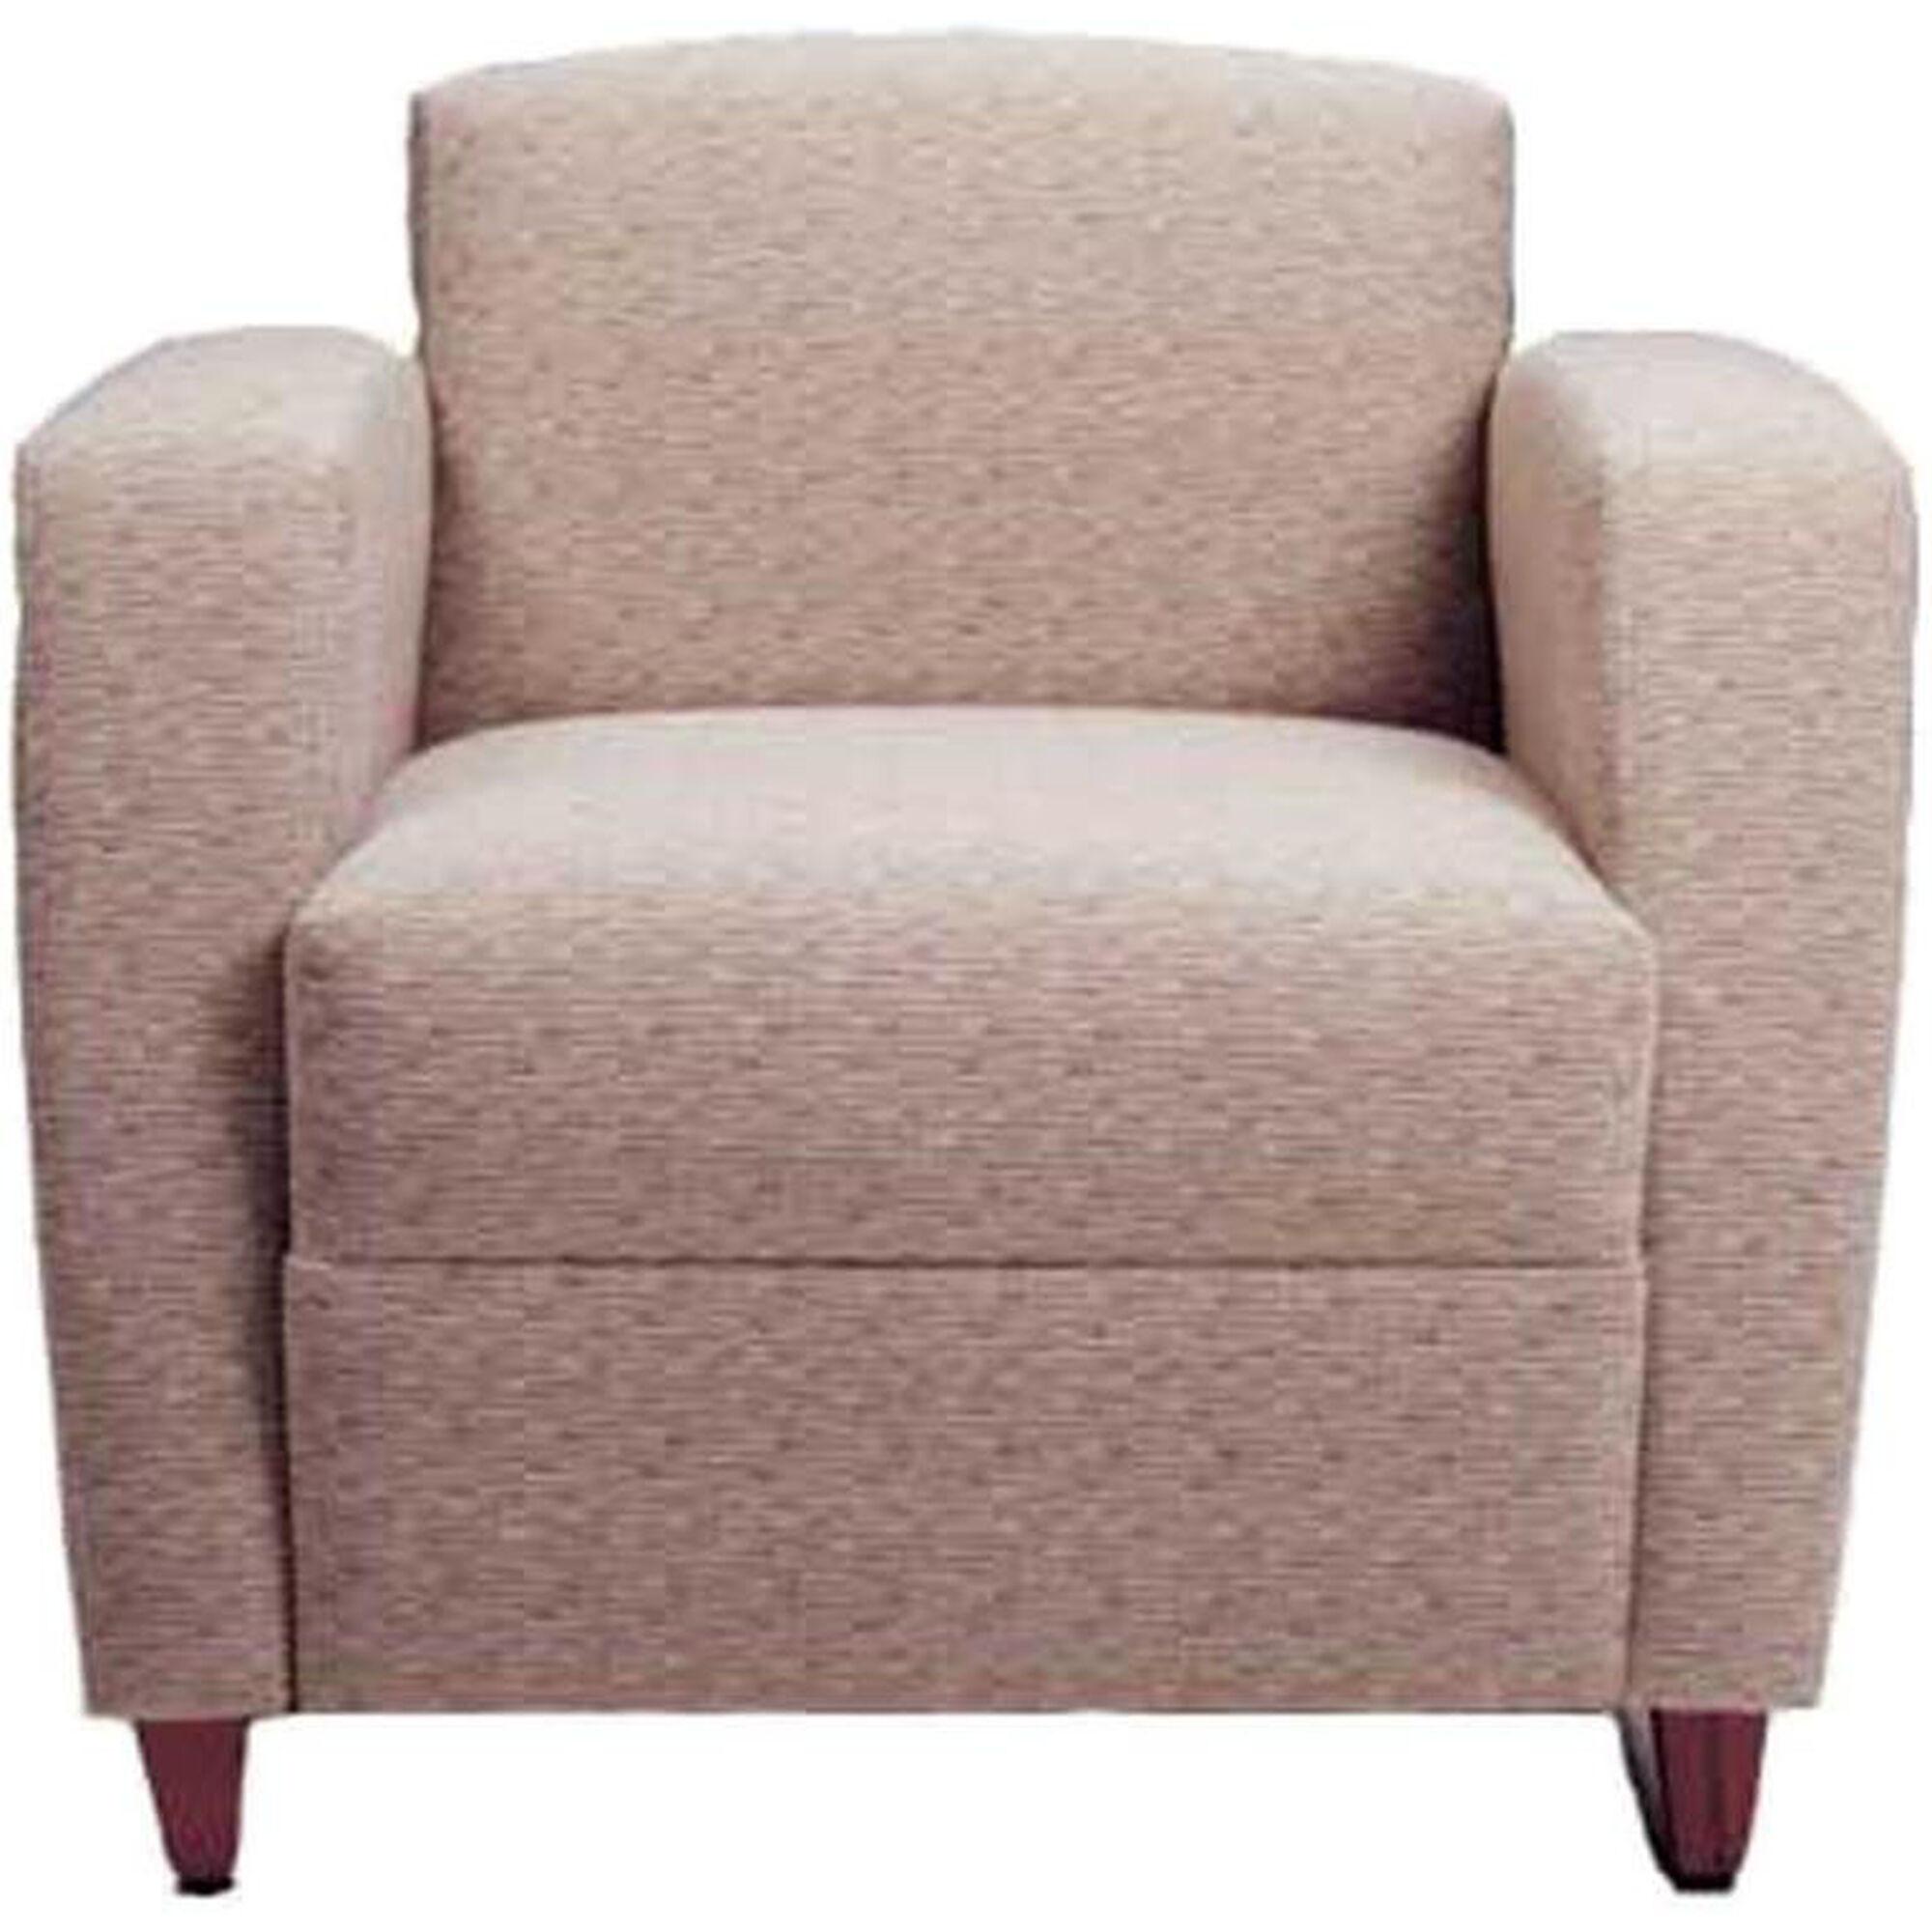 High Point Furniture Industries 5901 Hpf 5901